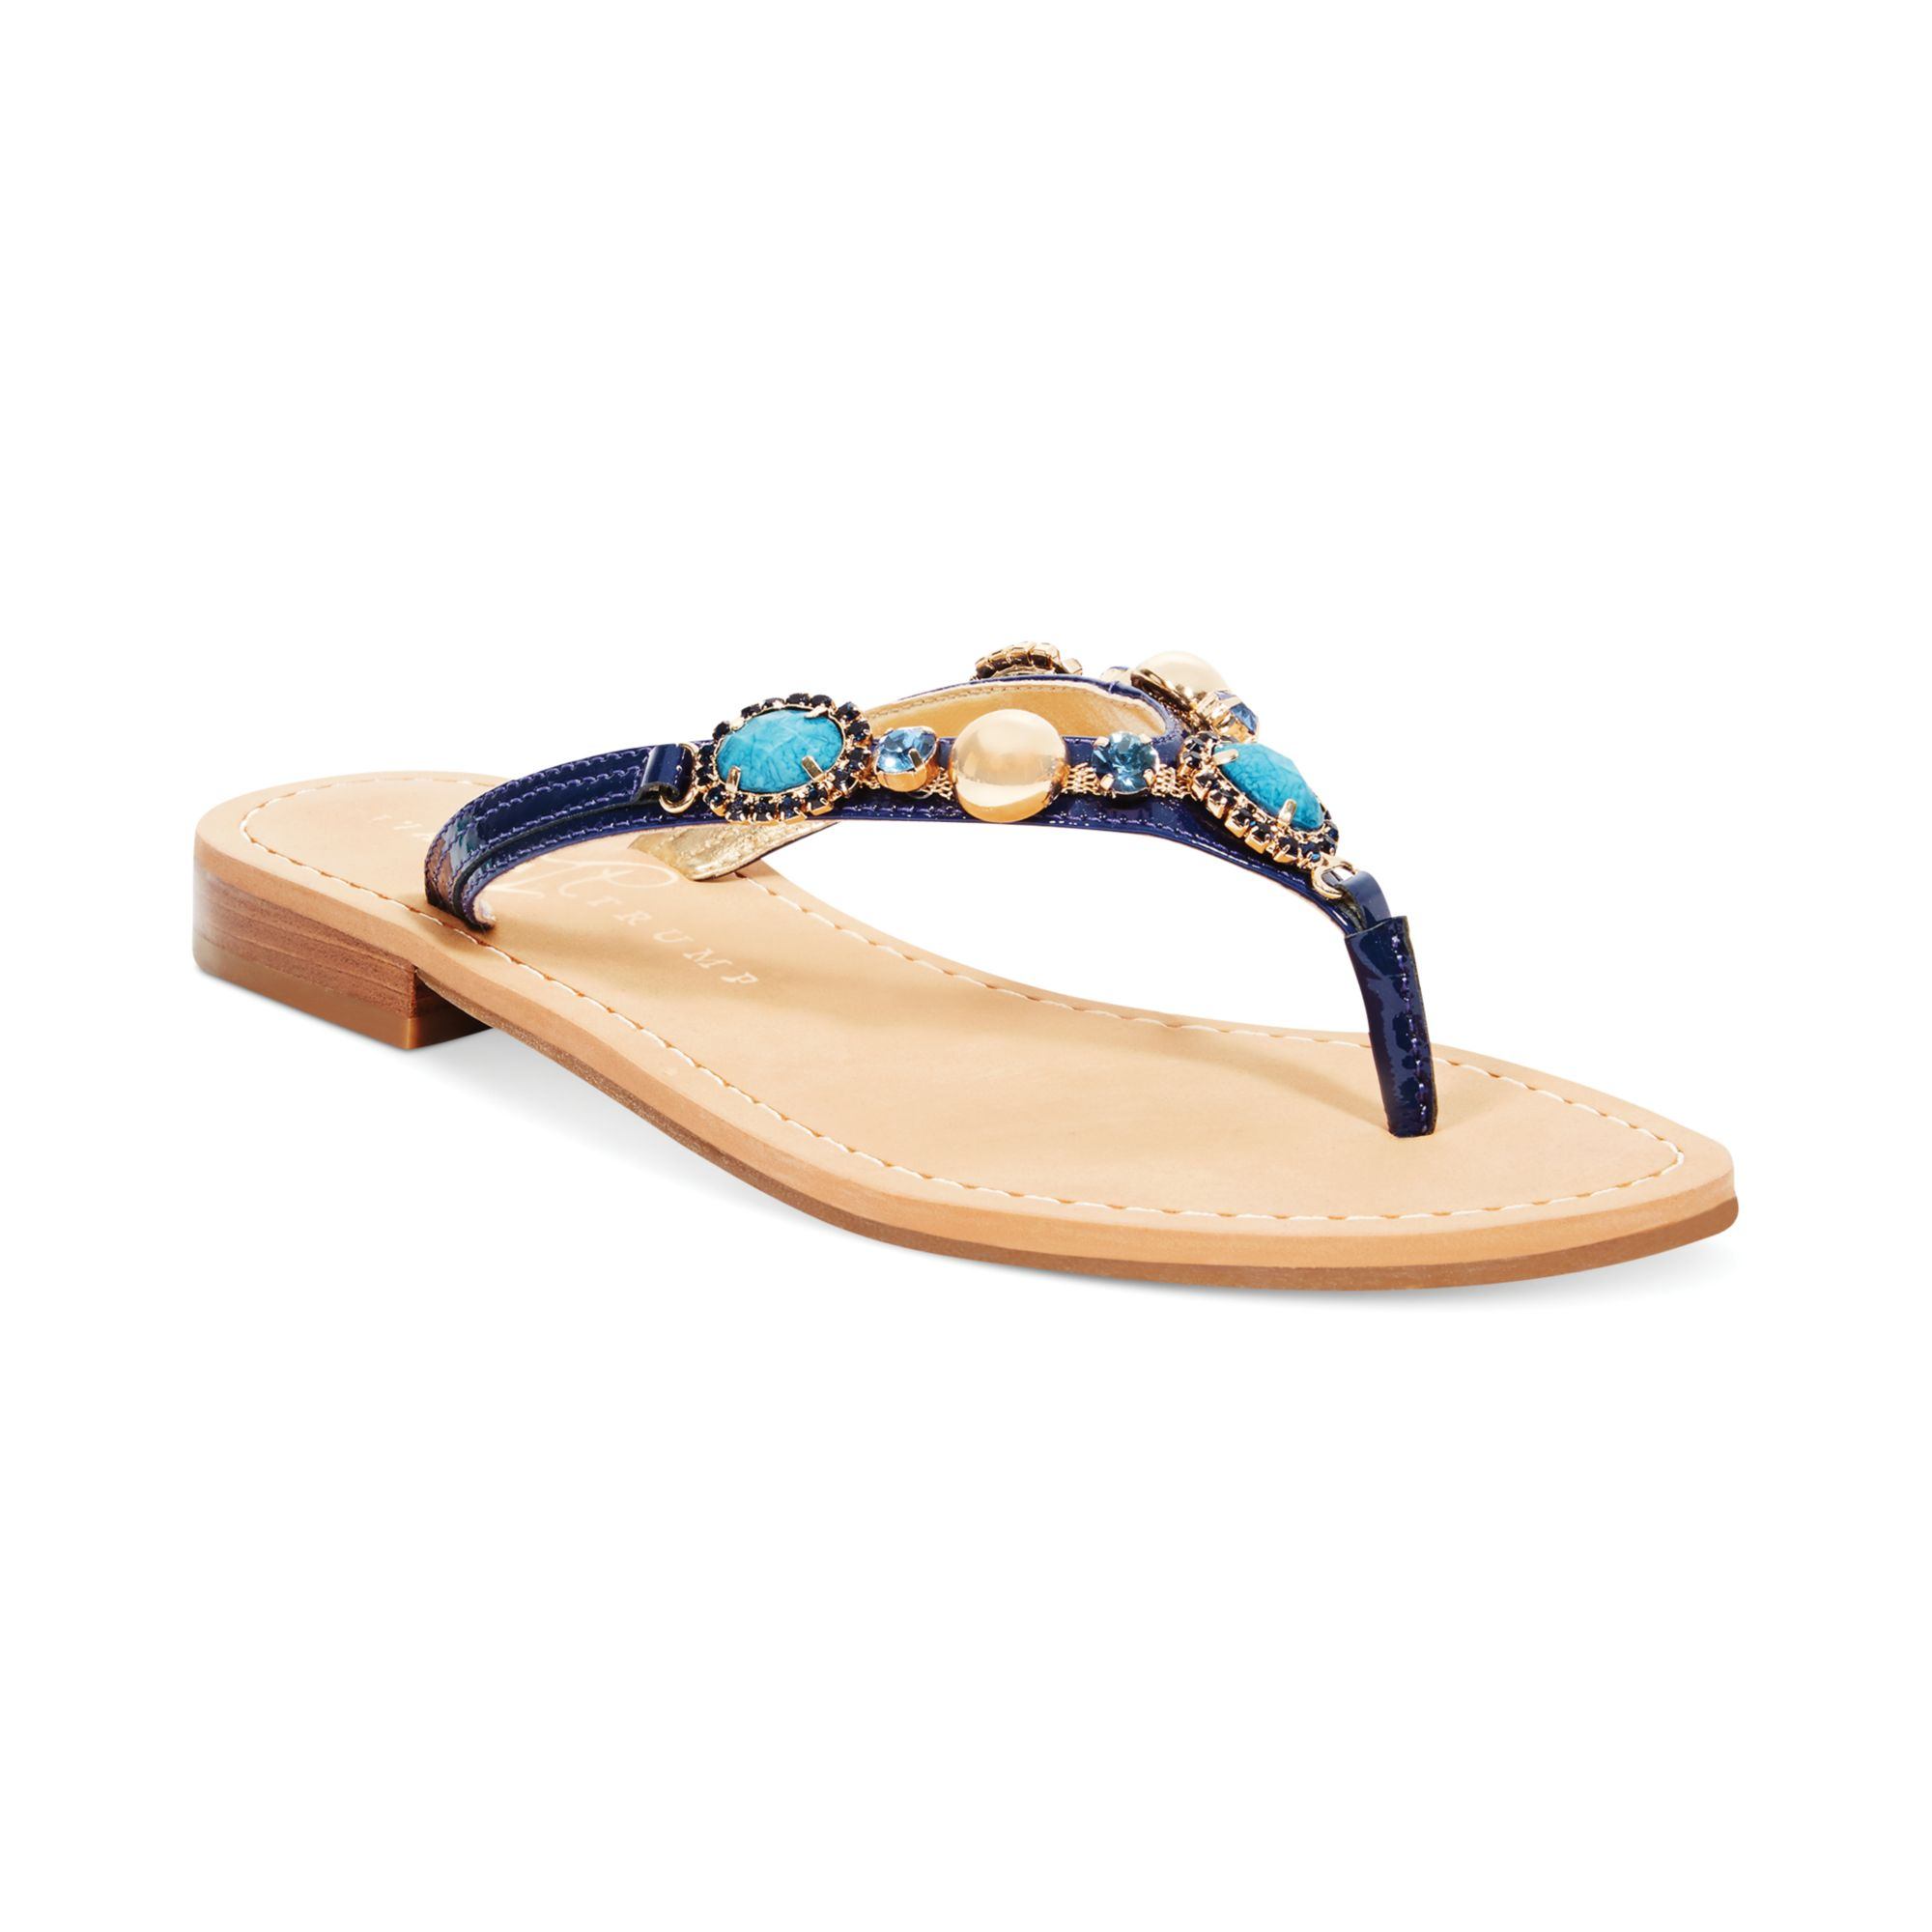 8f921a3ef Lyst - Ivanka Trump Pryor Flat Thong Sandals in Blue